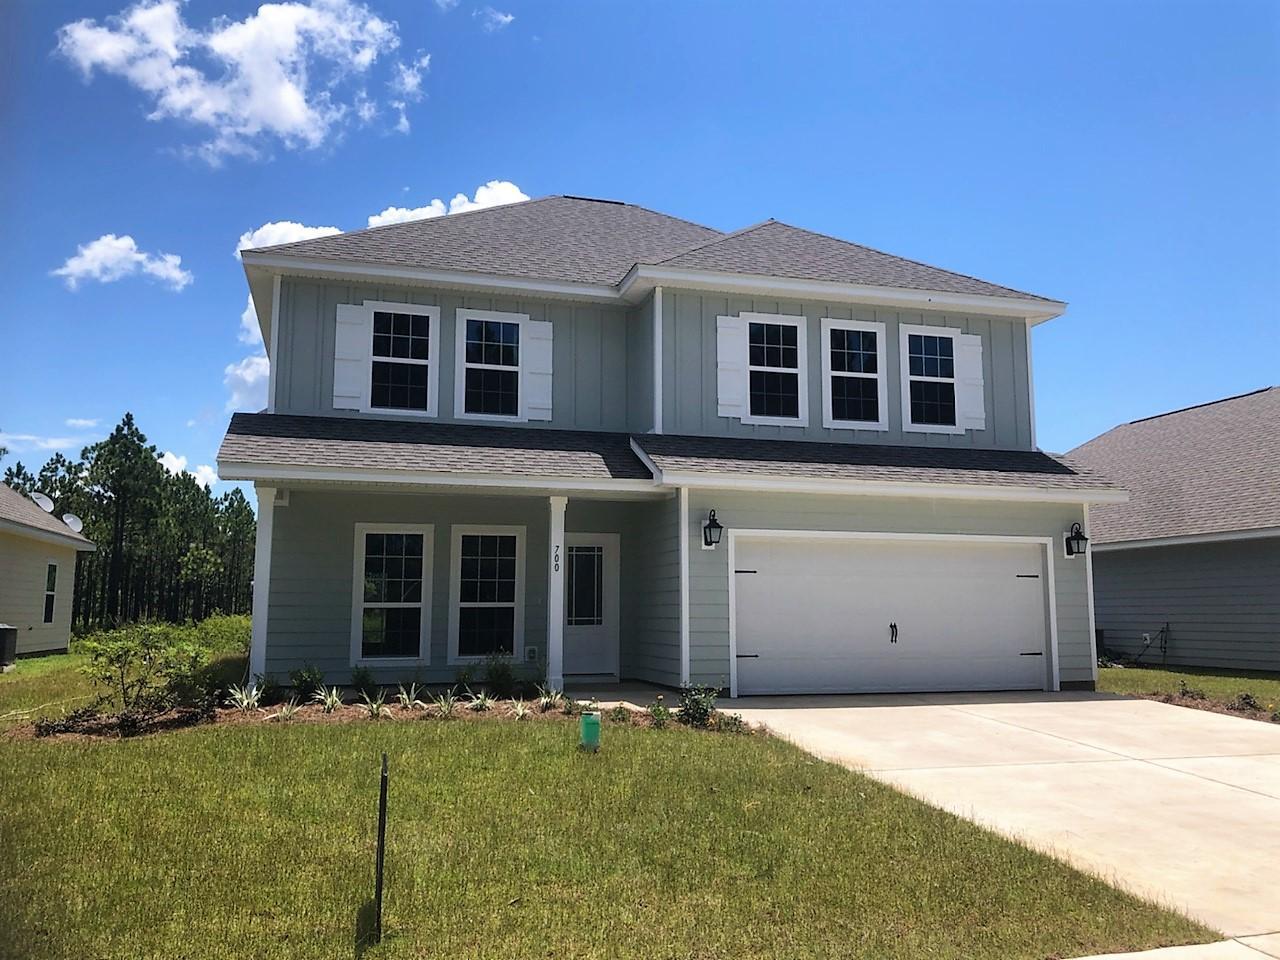 Photo of home for sale at 700 Alderberry, Santa Rosa Beach FL